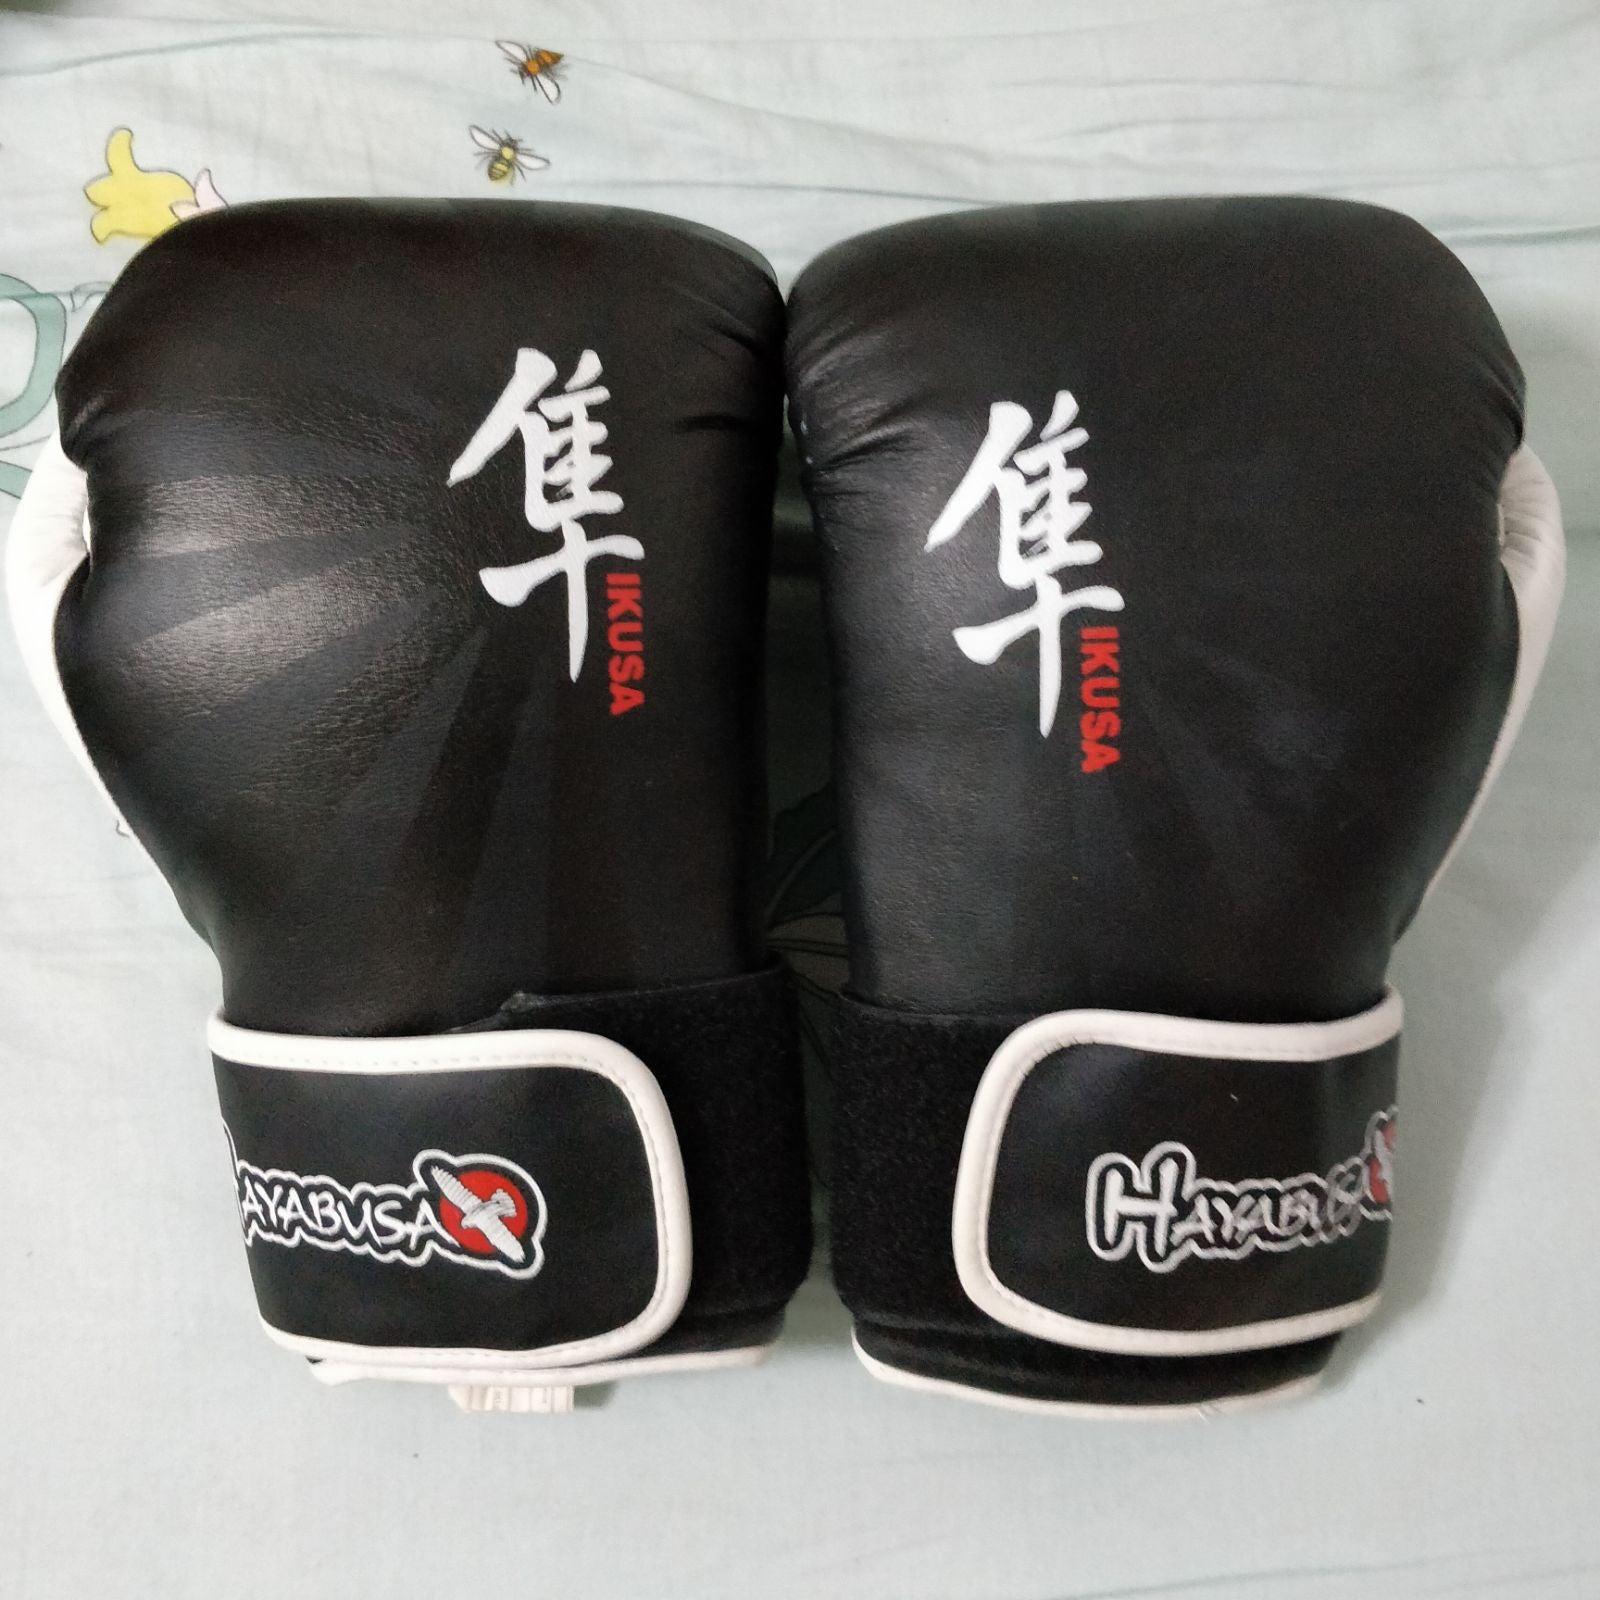 Hayasbusa Ikura Glove